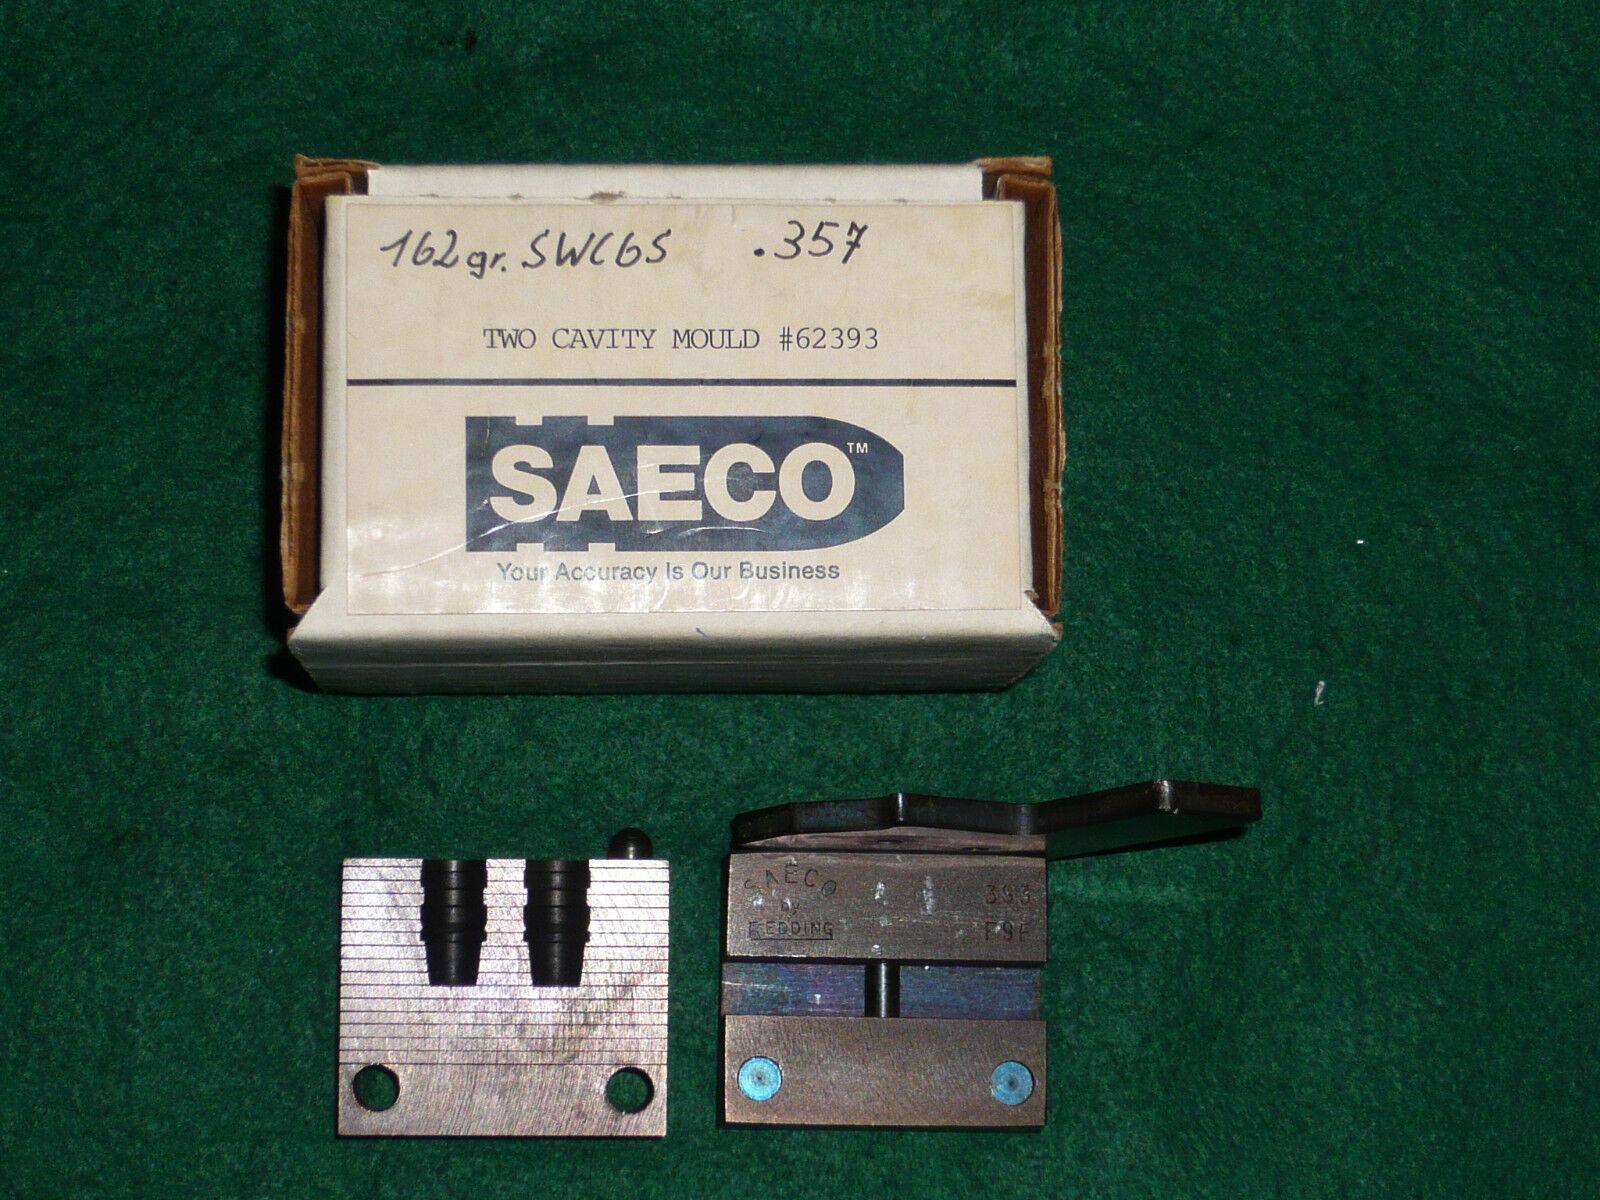 SAECO SAECO SAECO by rotding Doppelkokille Gießkokille Kaliber .38 .357 , 162 Grain SWC 93208b